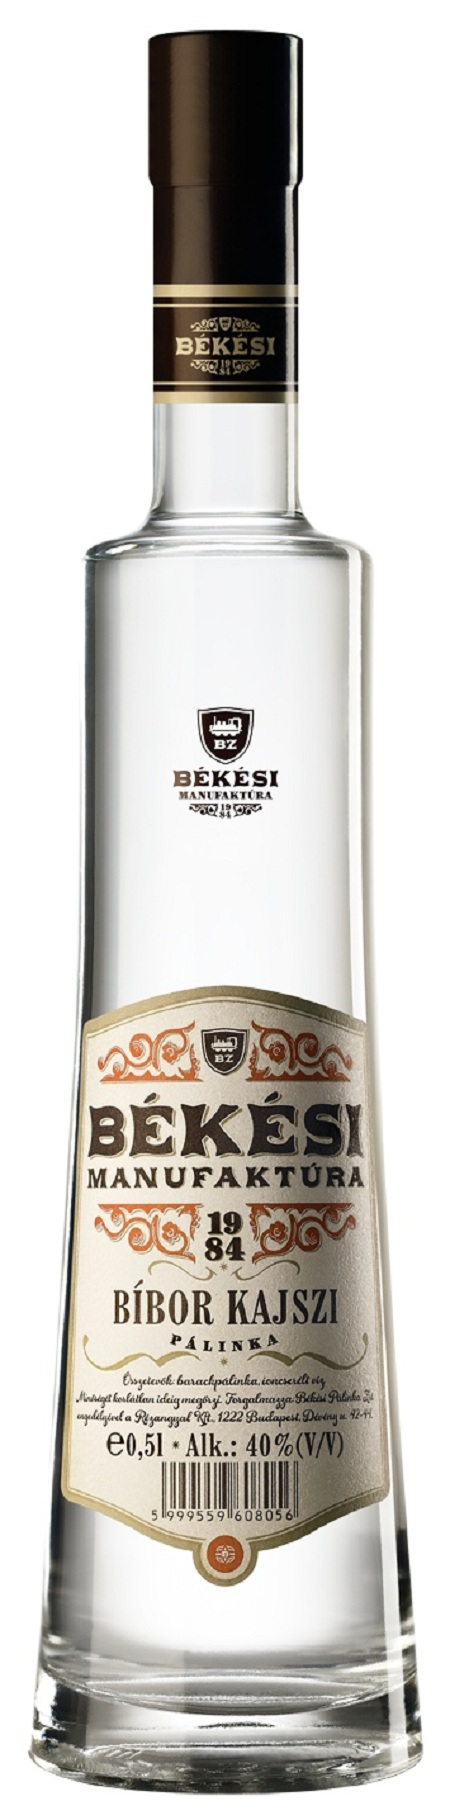 bekesi_packshot_kajszi_1.jpg